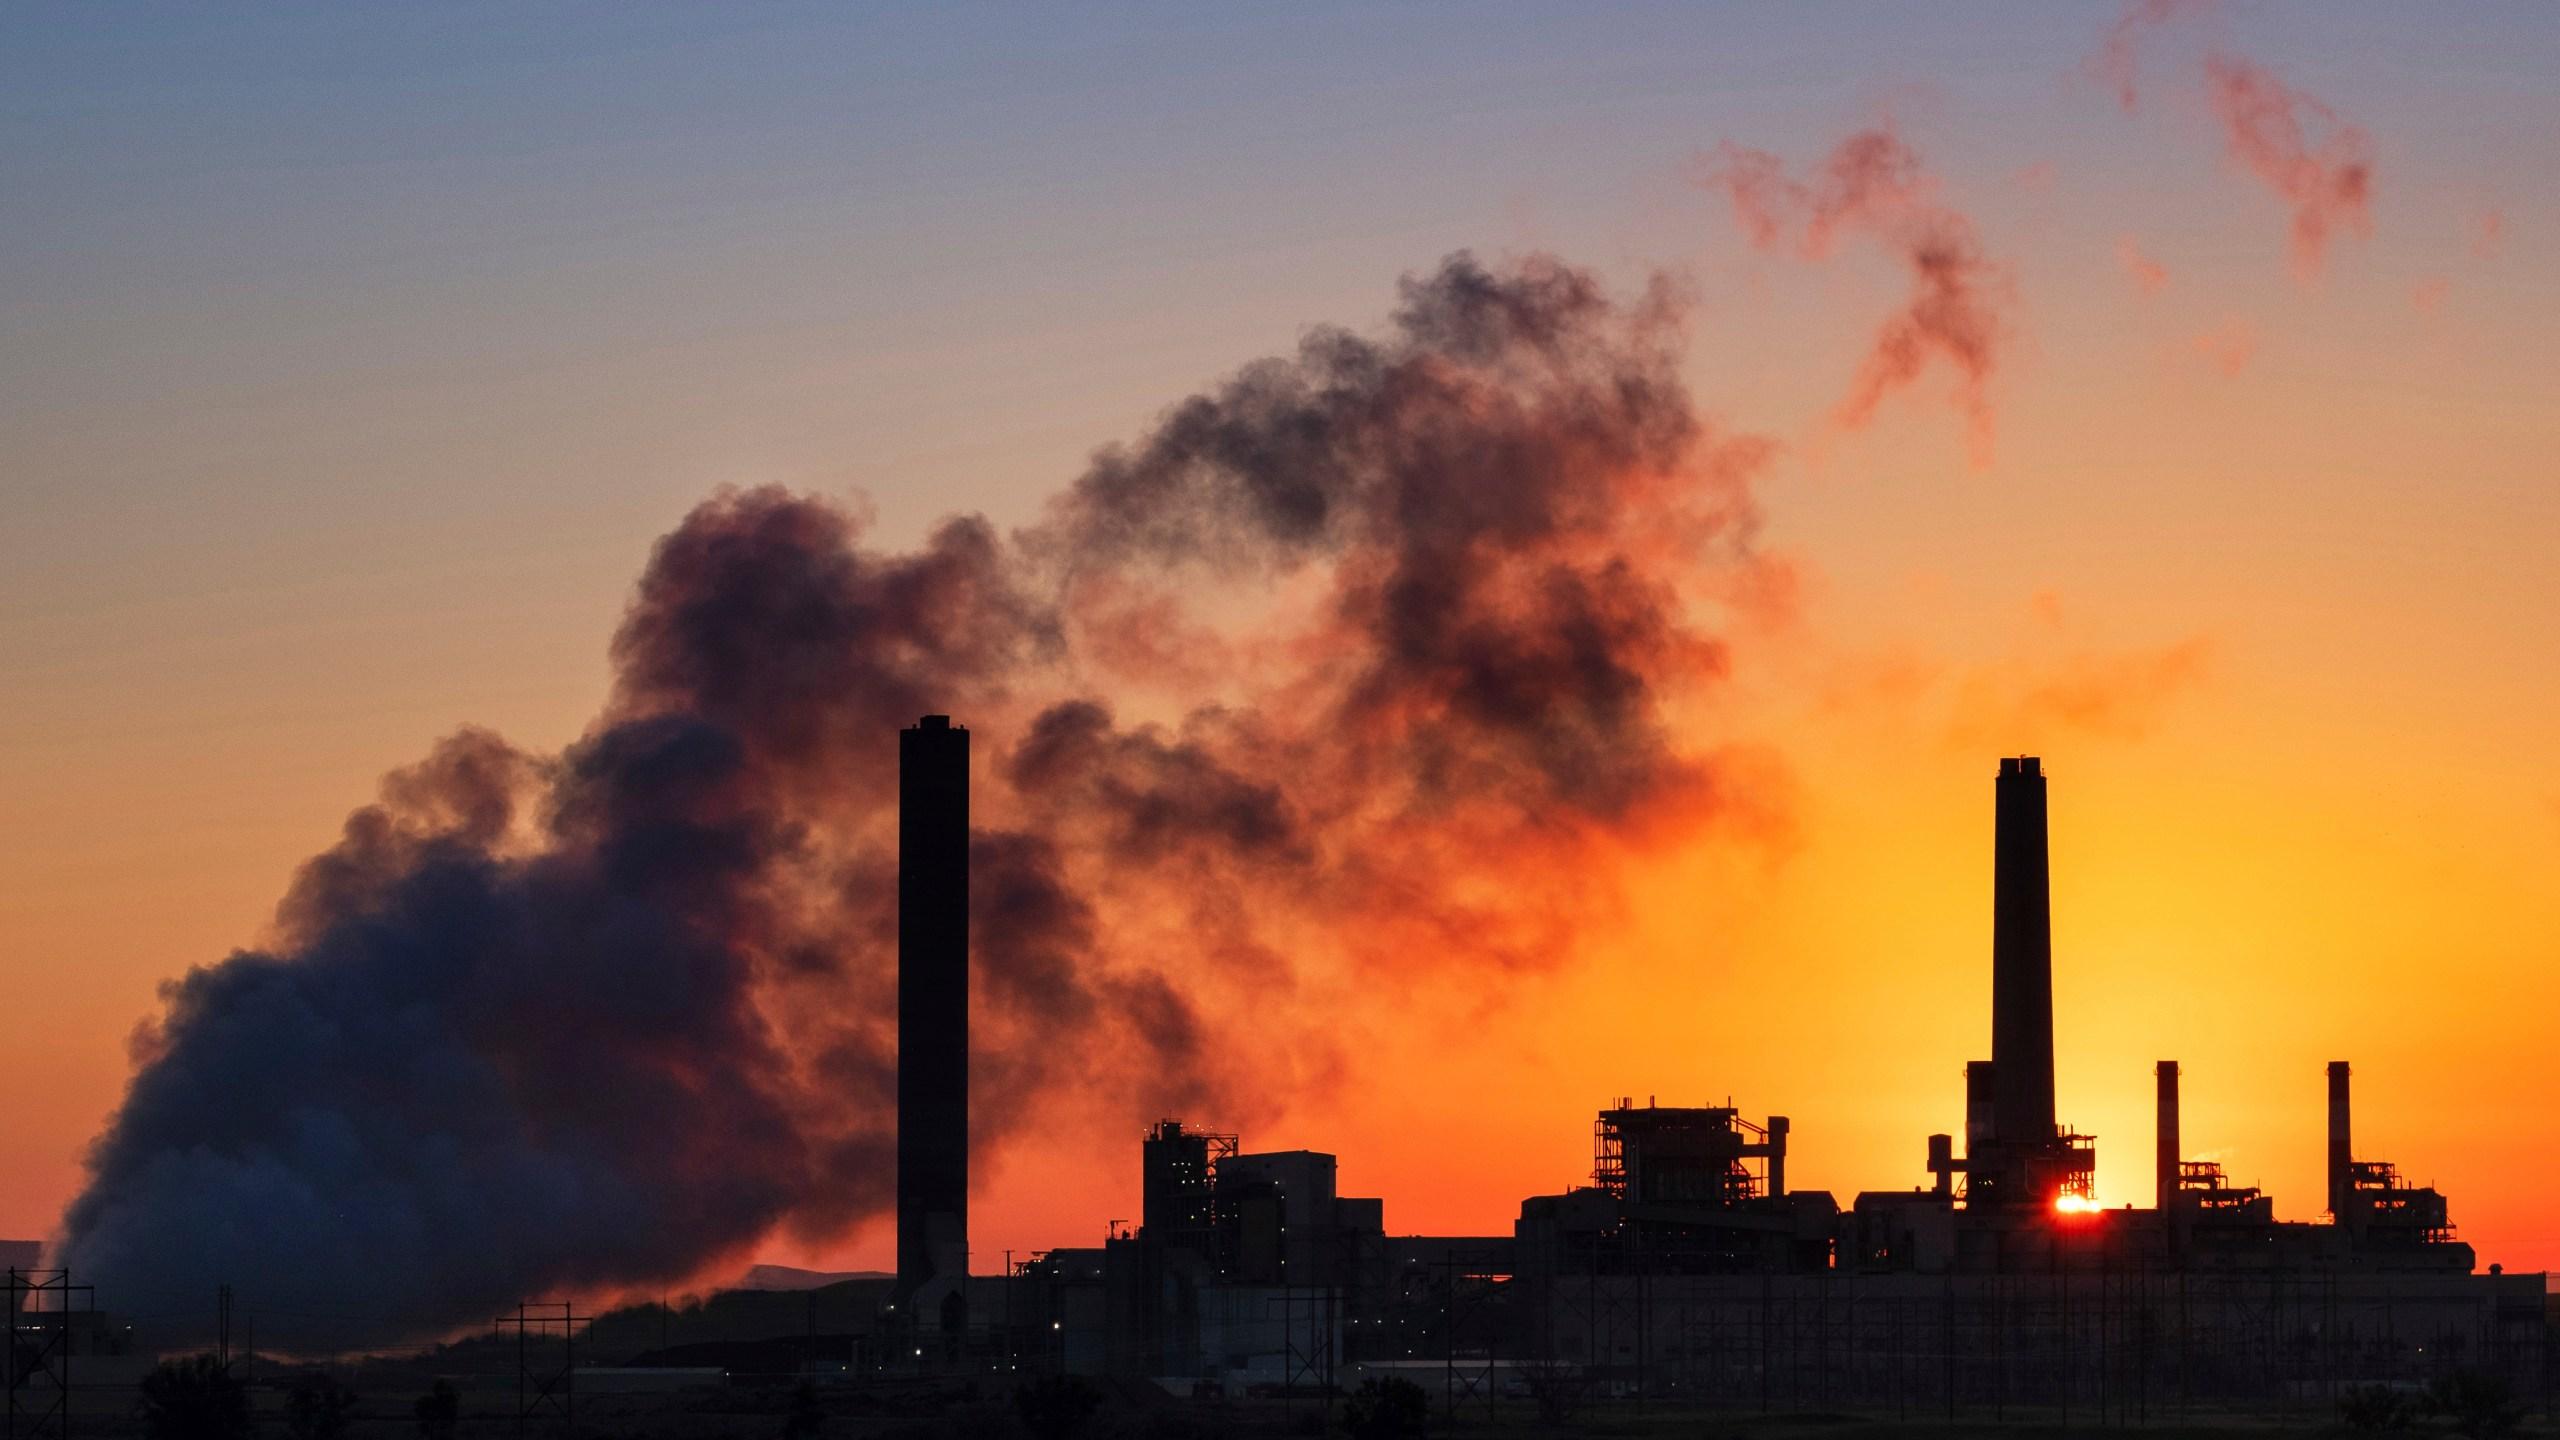 EPA_Coal_29687-159532.jpg92564967